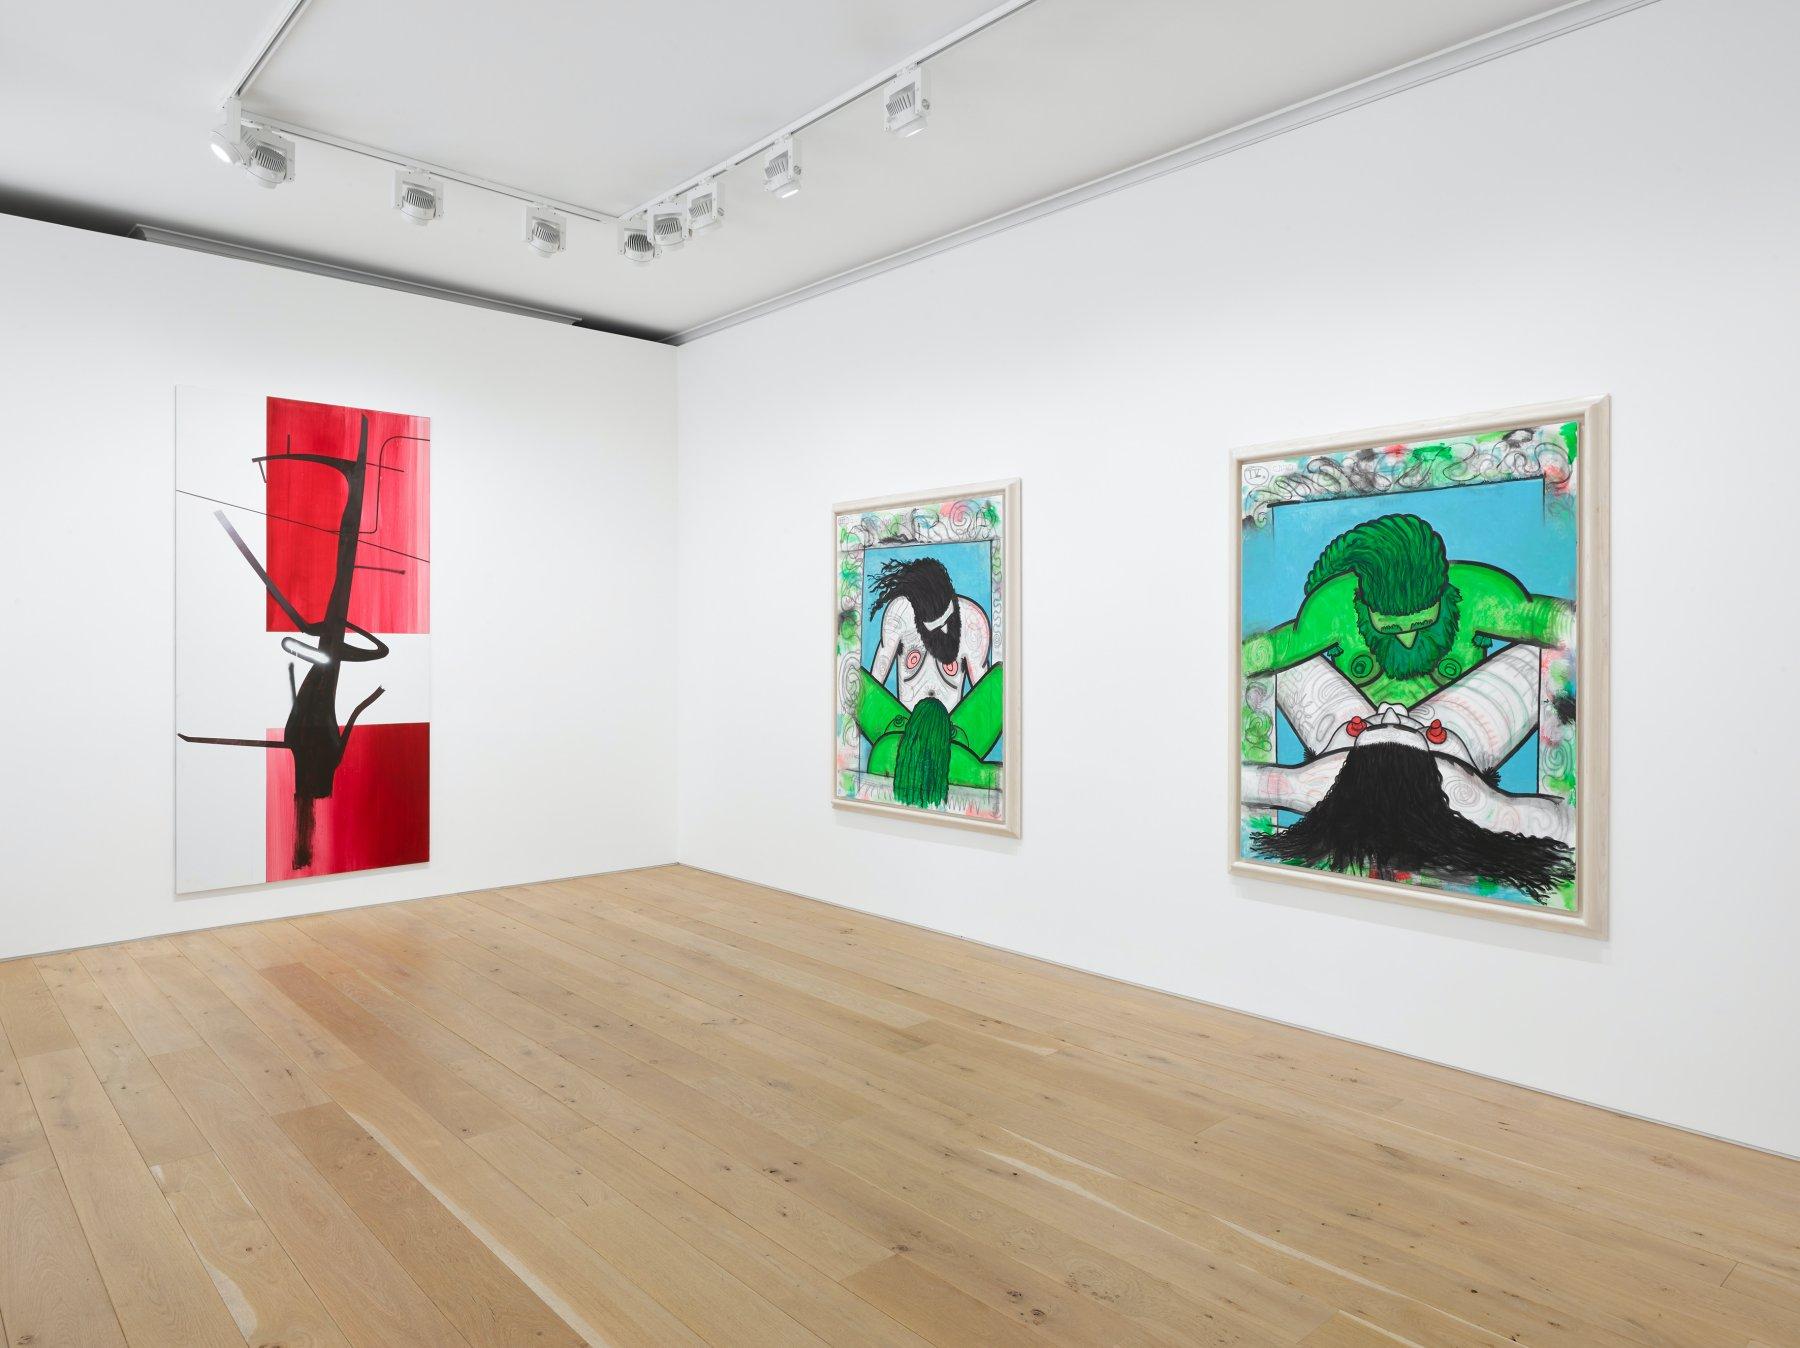 Galerie Max Hetzler London Carroll Dunham Albert Oehlen 1